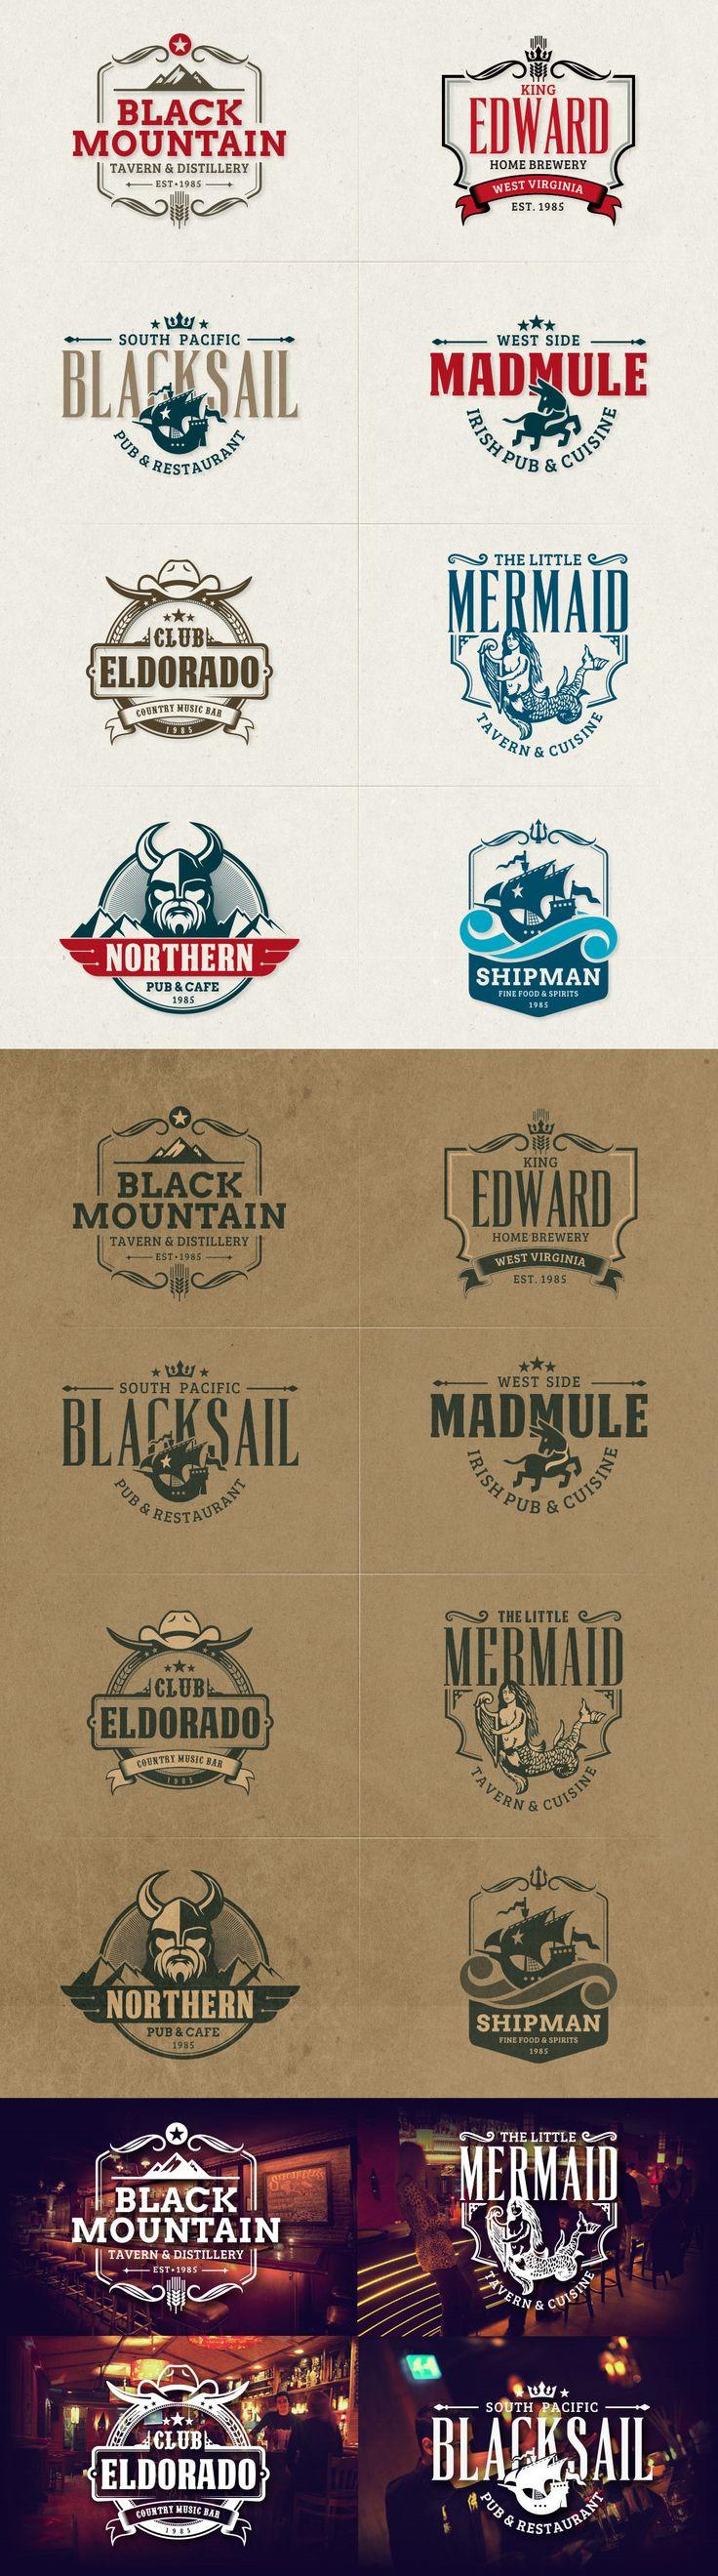 8 Retro Badges & Insignias for Cafe, Bar, Pub, Tavern and Restaurant #design Download: https://creativemarket.com/sgcanturk/369477-Cafe-Bar-Badge-Logos?u=ksioks